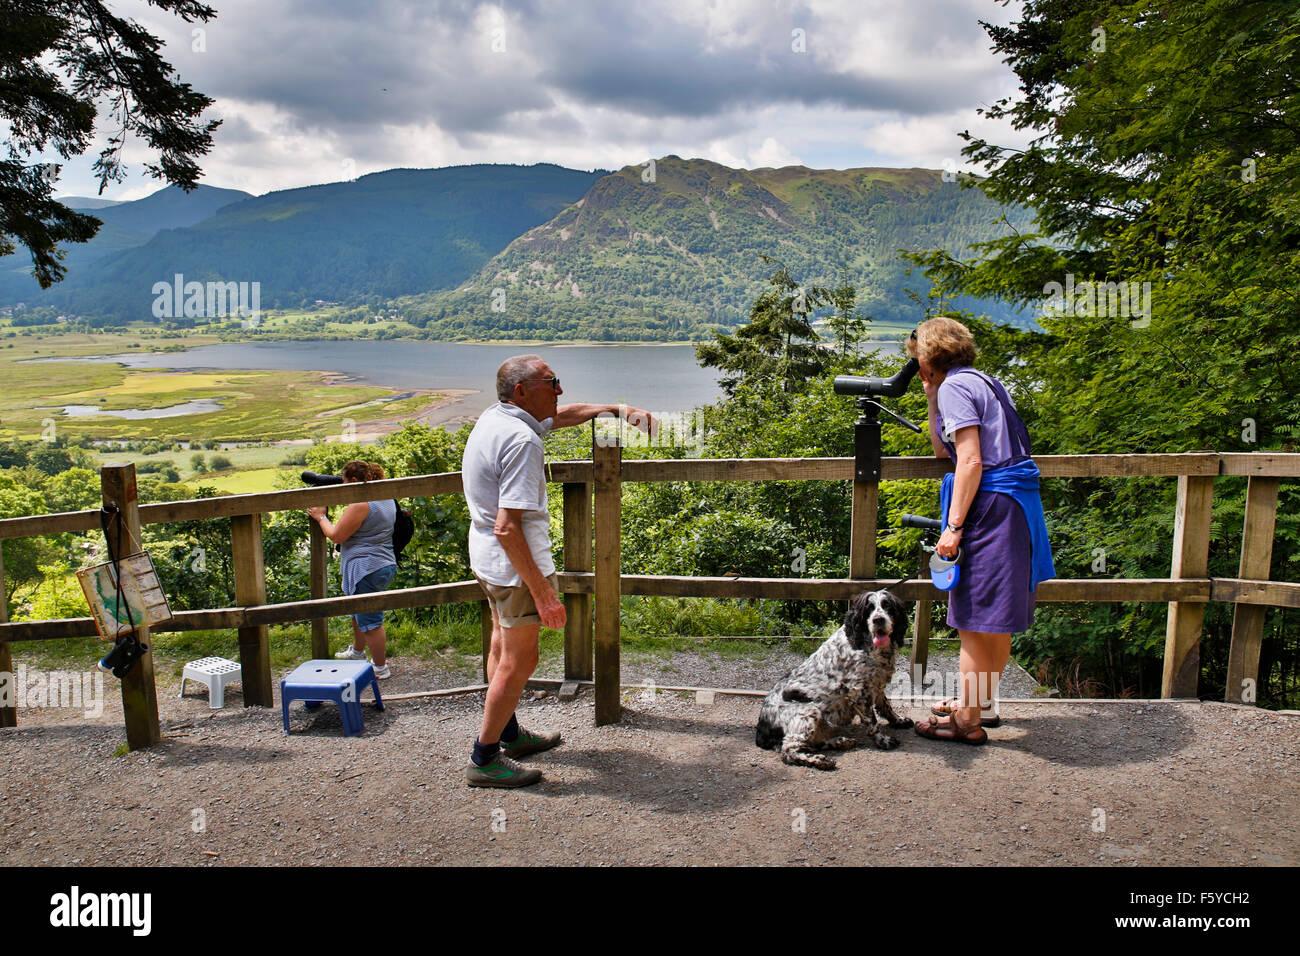 Dodd Wood; Osprey View Point; Bassenthwaite; Cumbria; UK - Stock Image